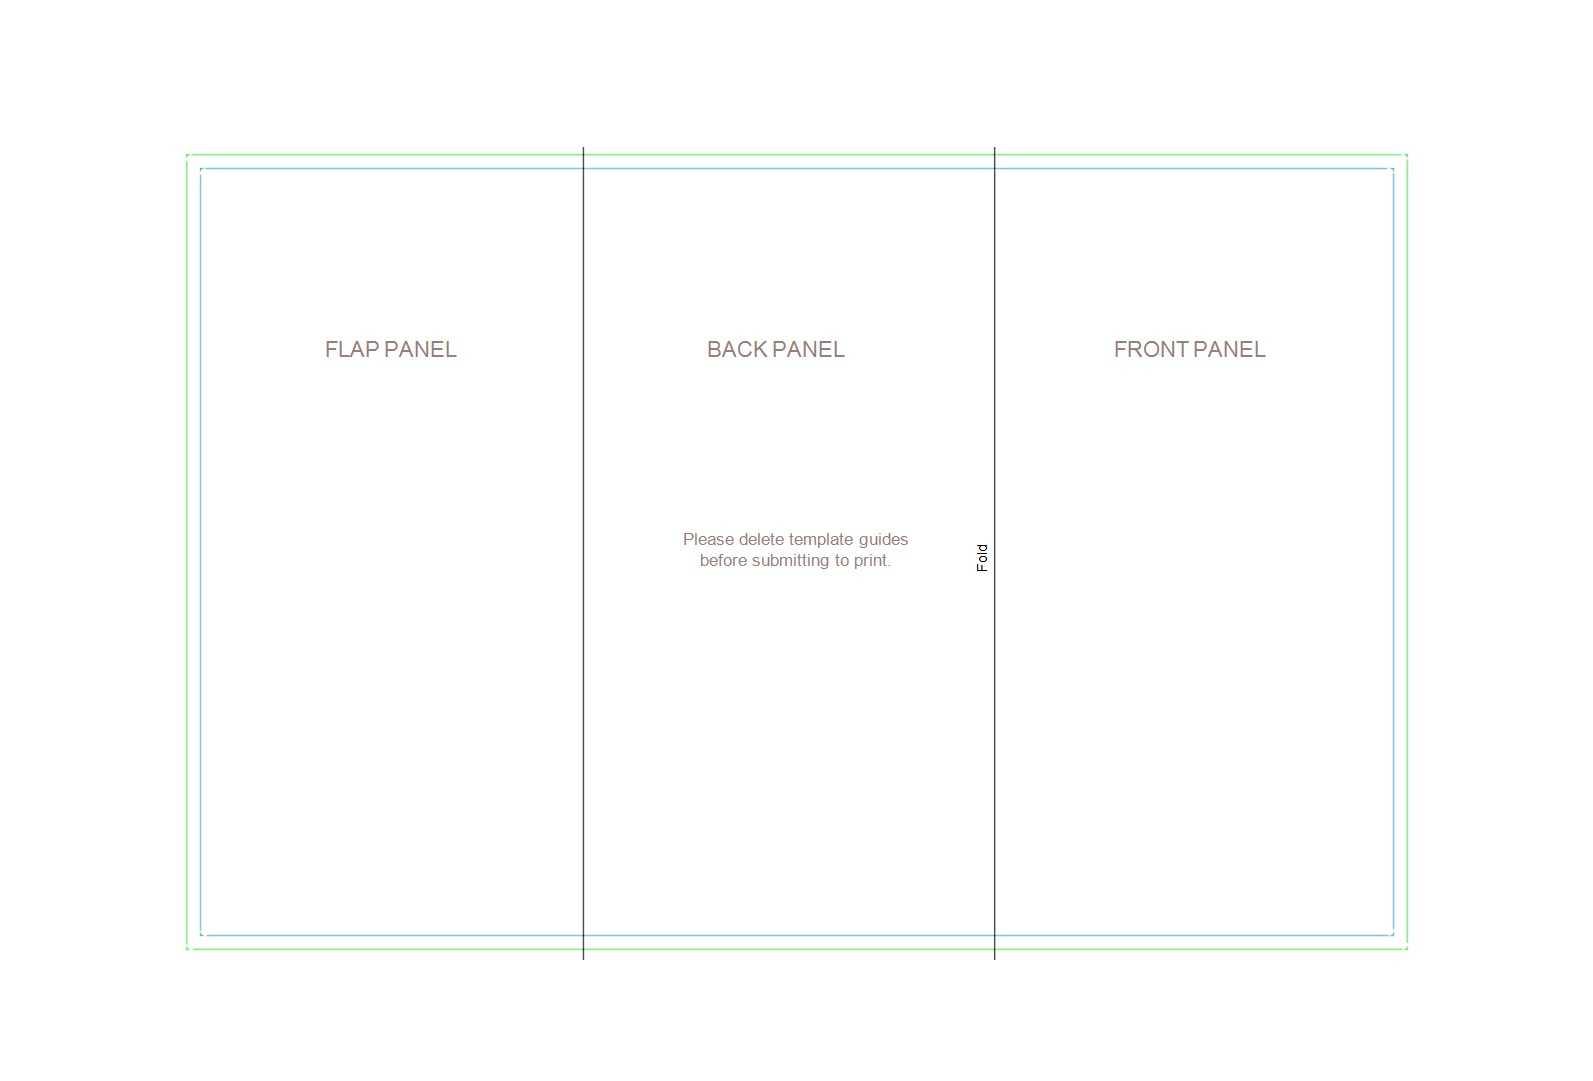 50 Free Pamphlet Templates [Word / Google Docs] ᐅ Templatelab Regarding Brochure Templates Google Docs